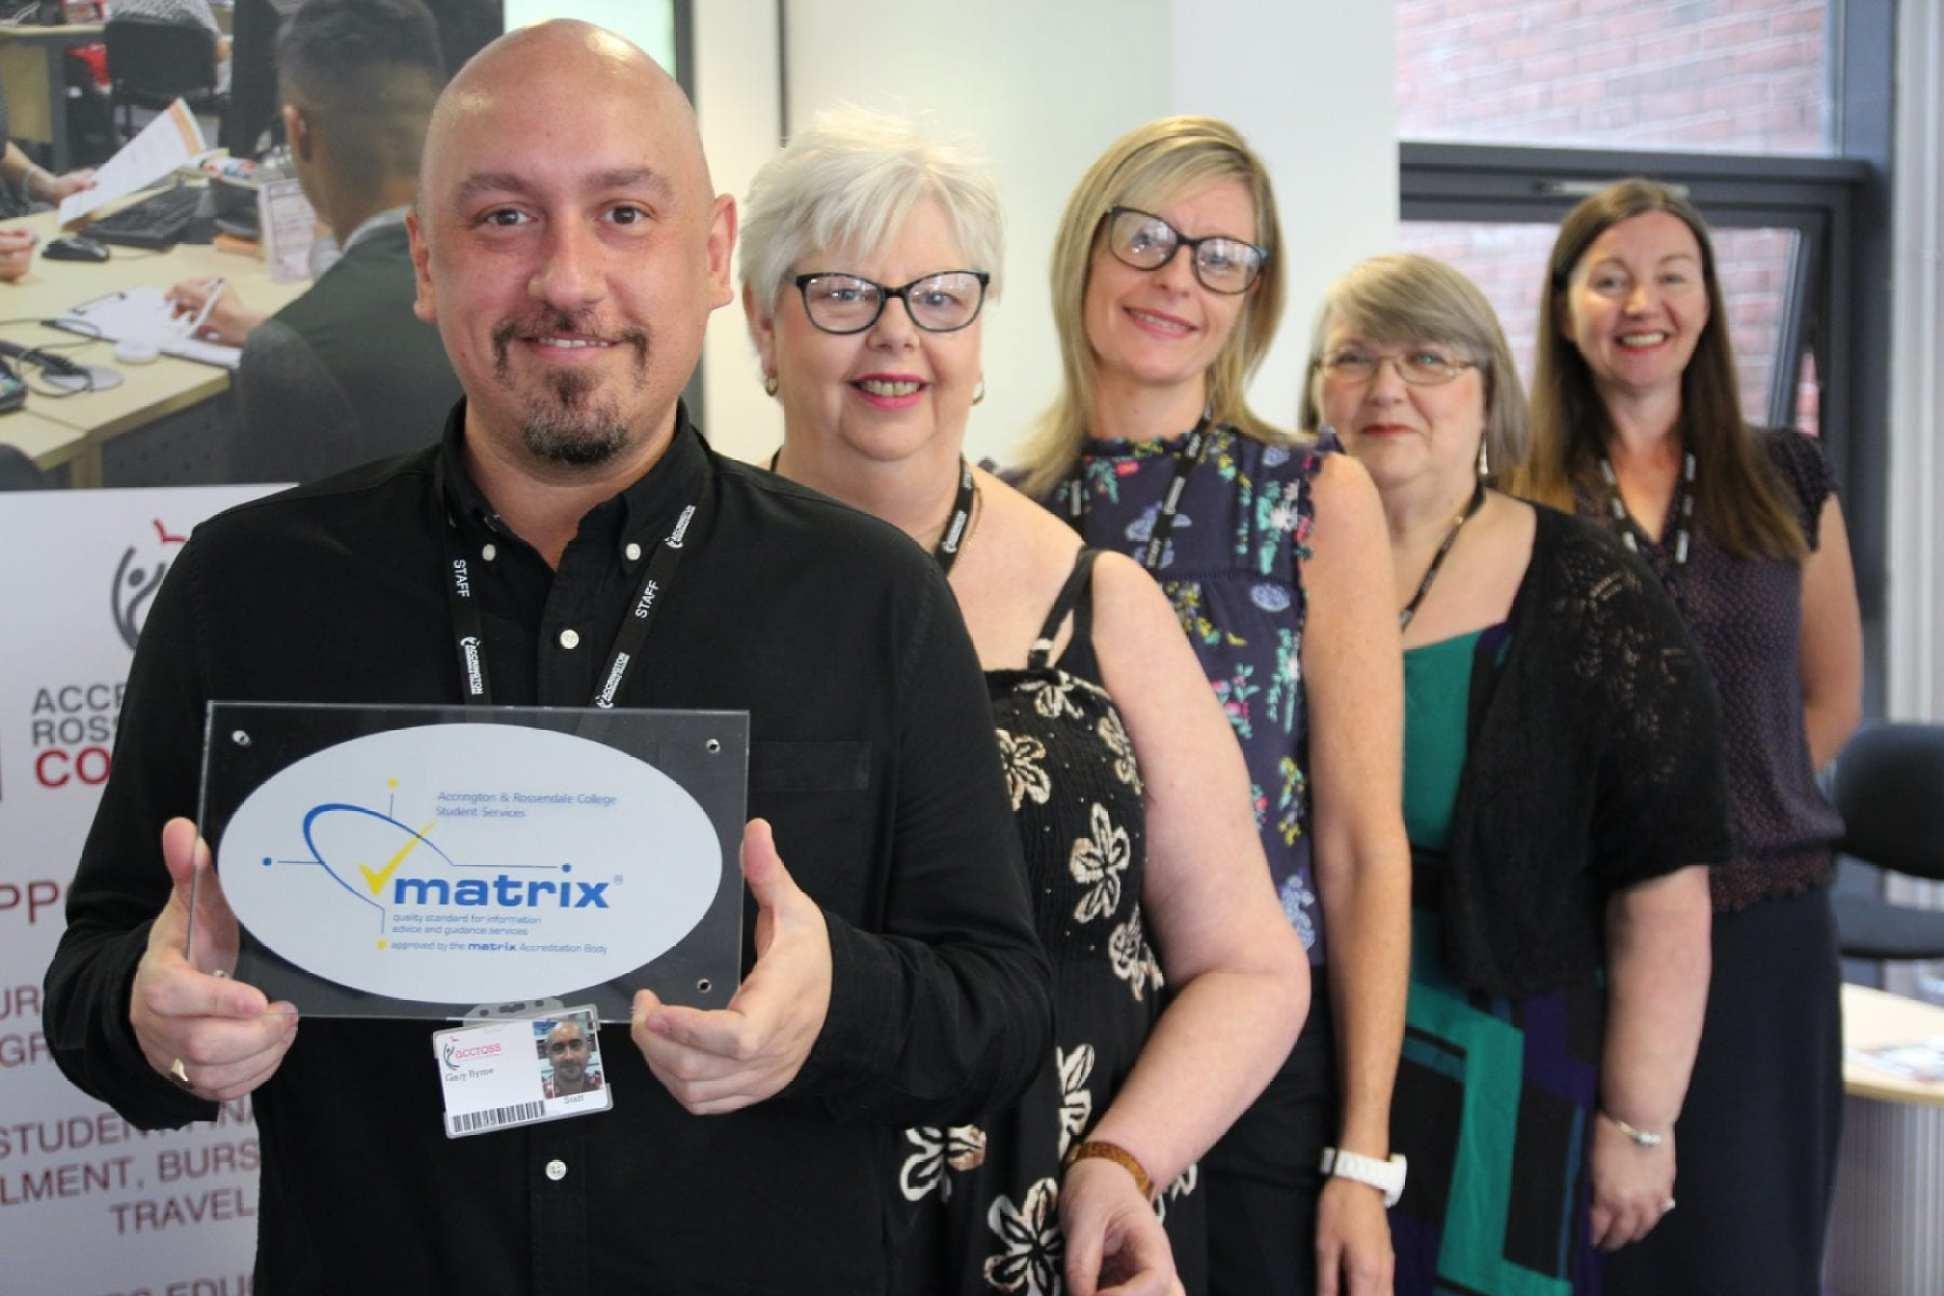 Matrix Stand award